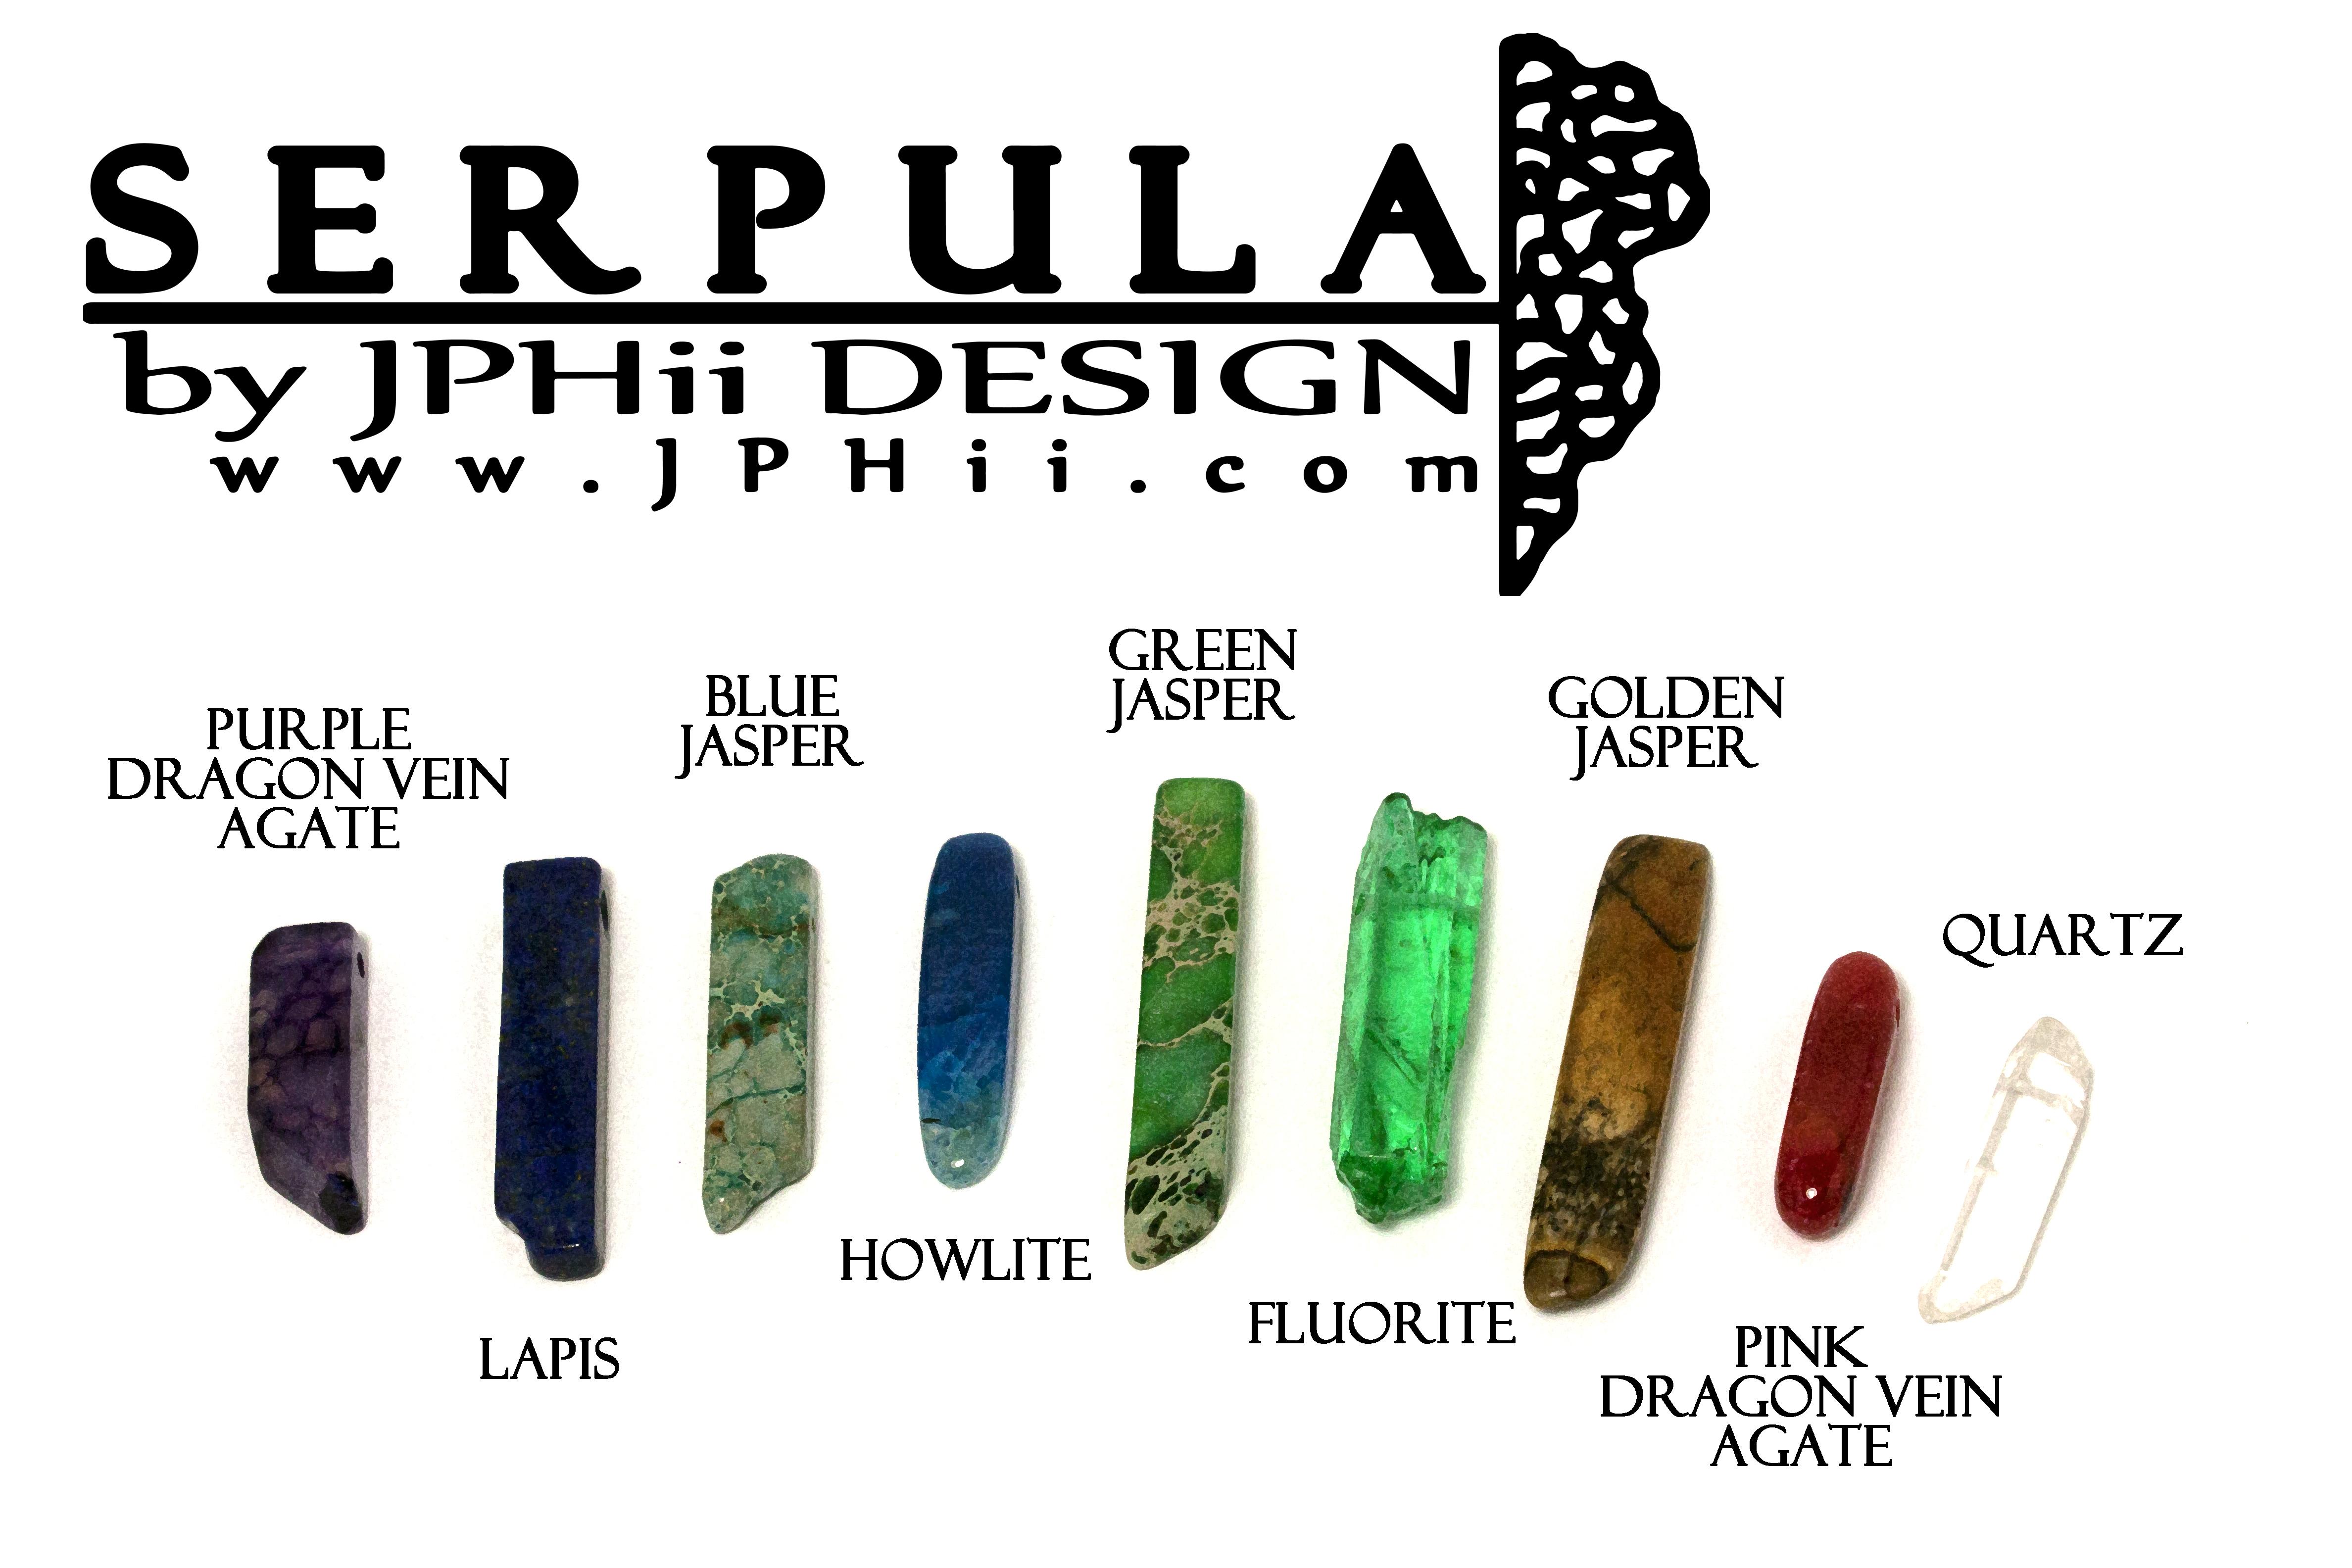 Serpula Stone Choices